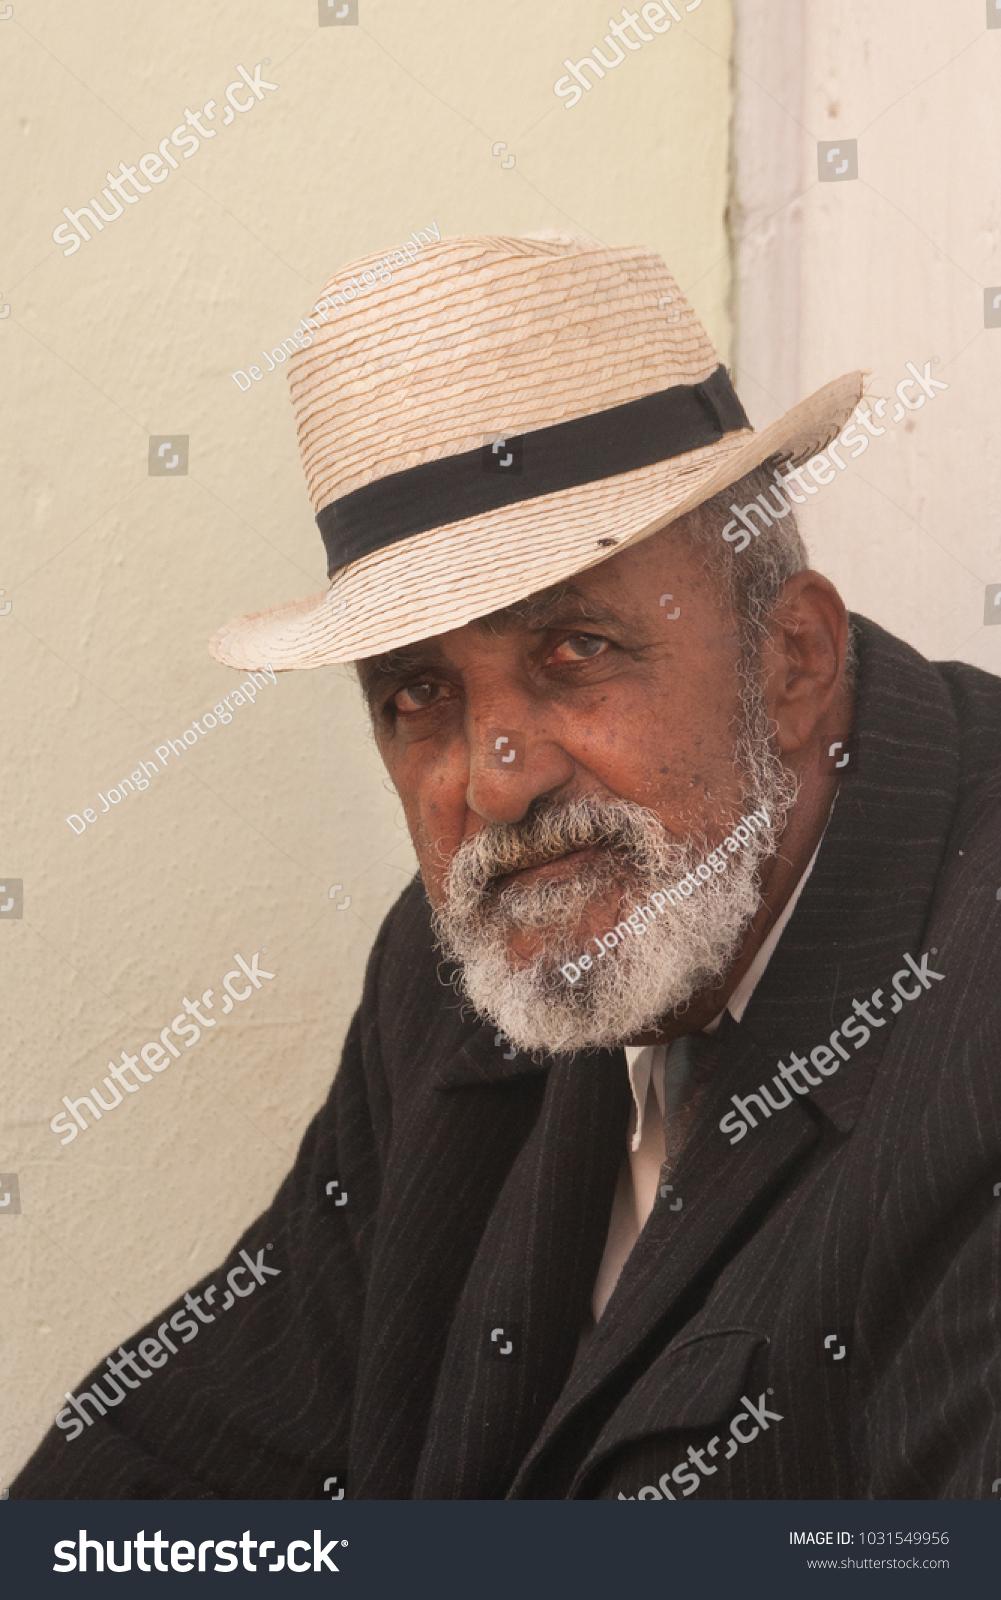 Trinidad Cuba January 28 2018 Portrait Stock Photo (Edit Now ... c5fc40e3651a